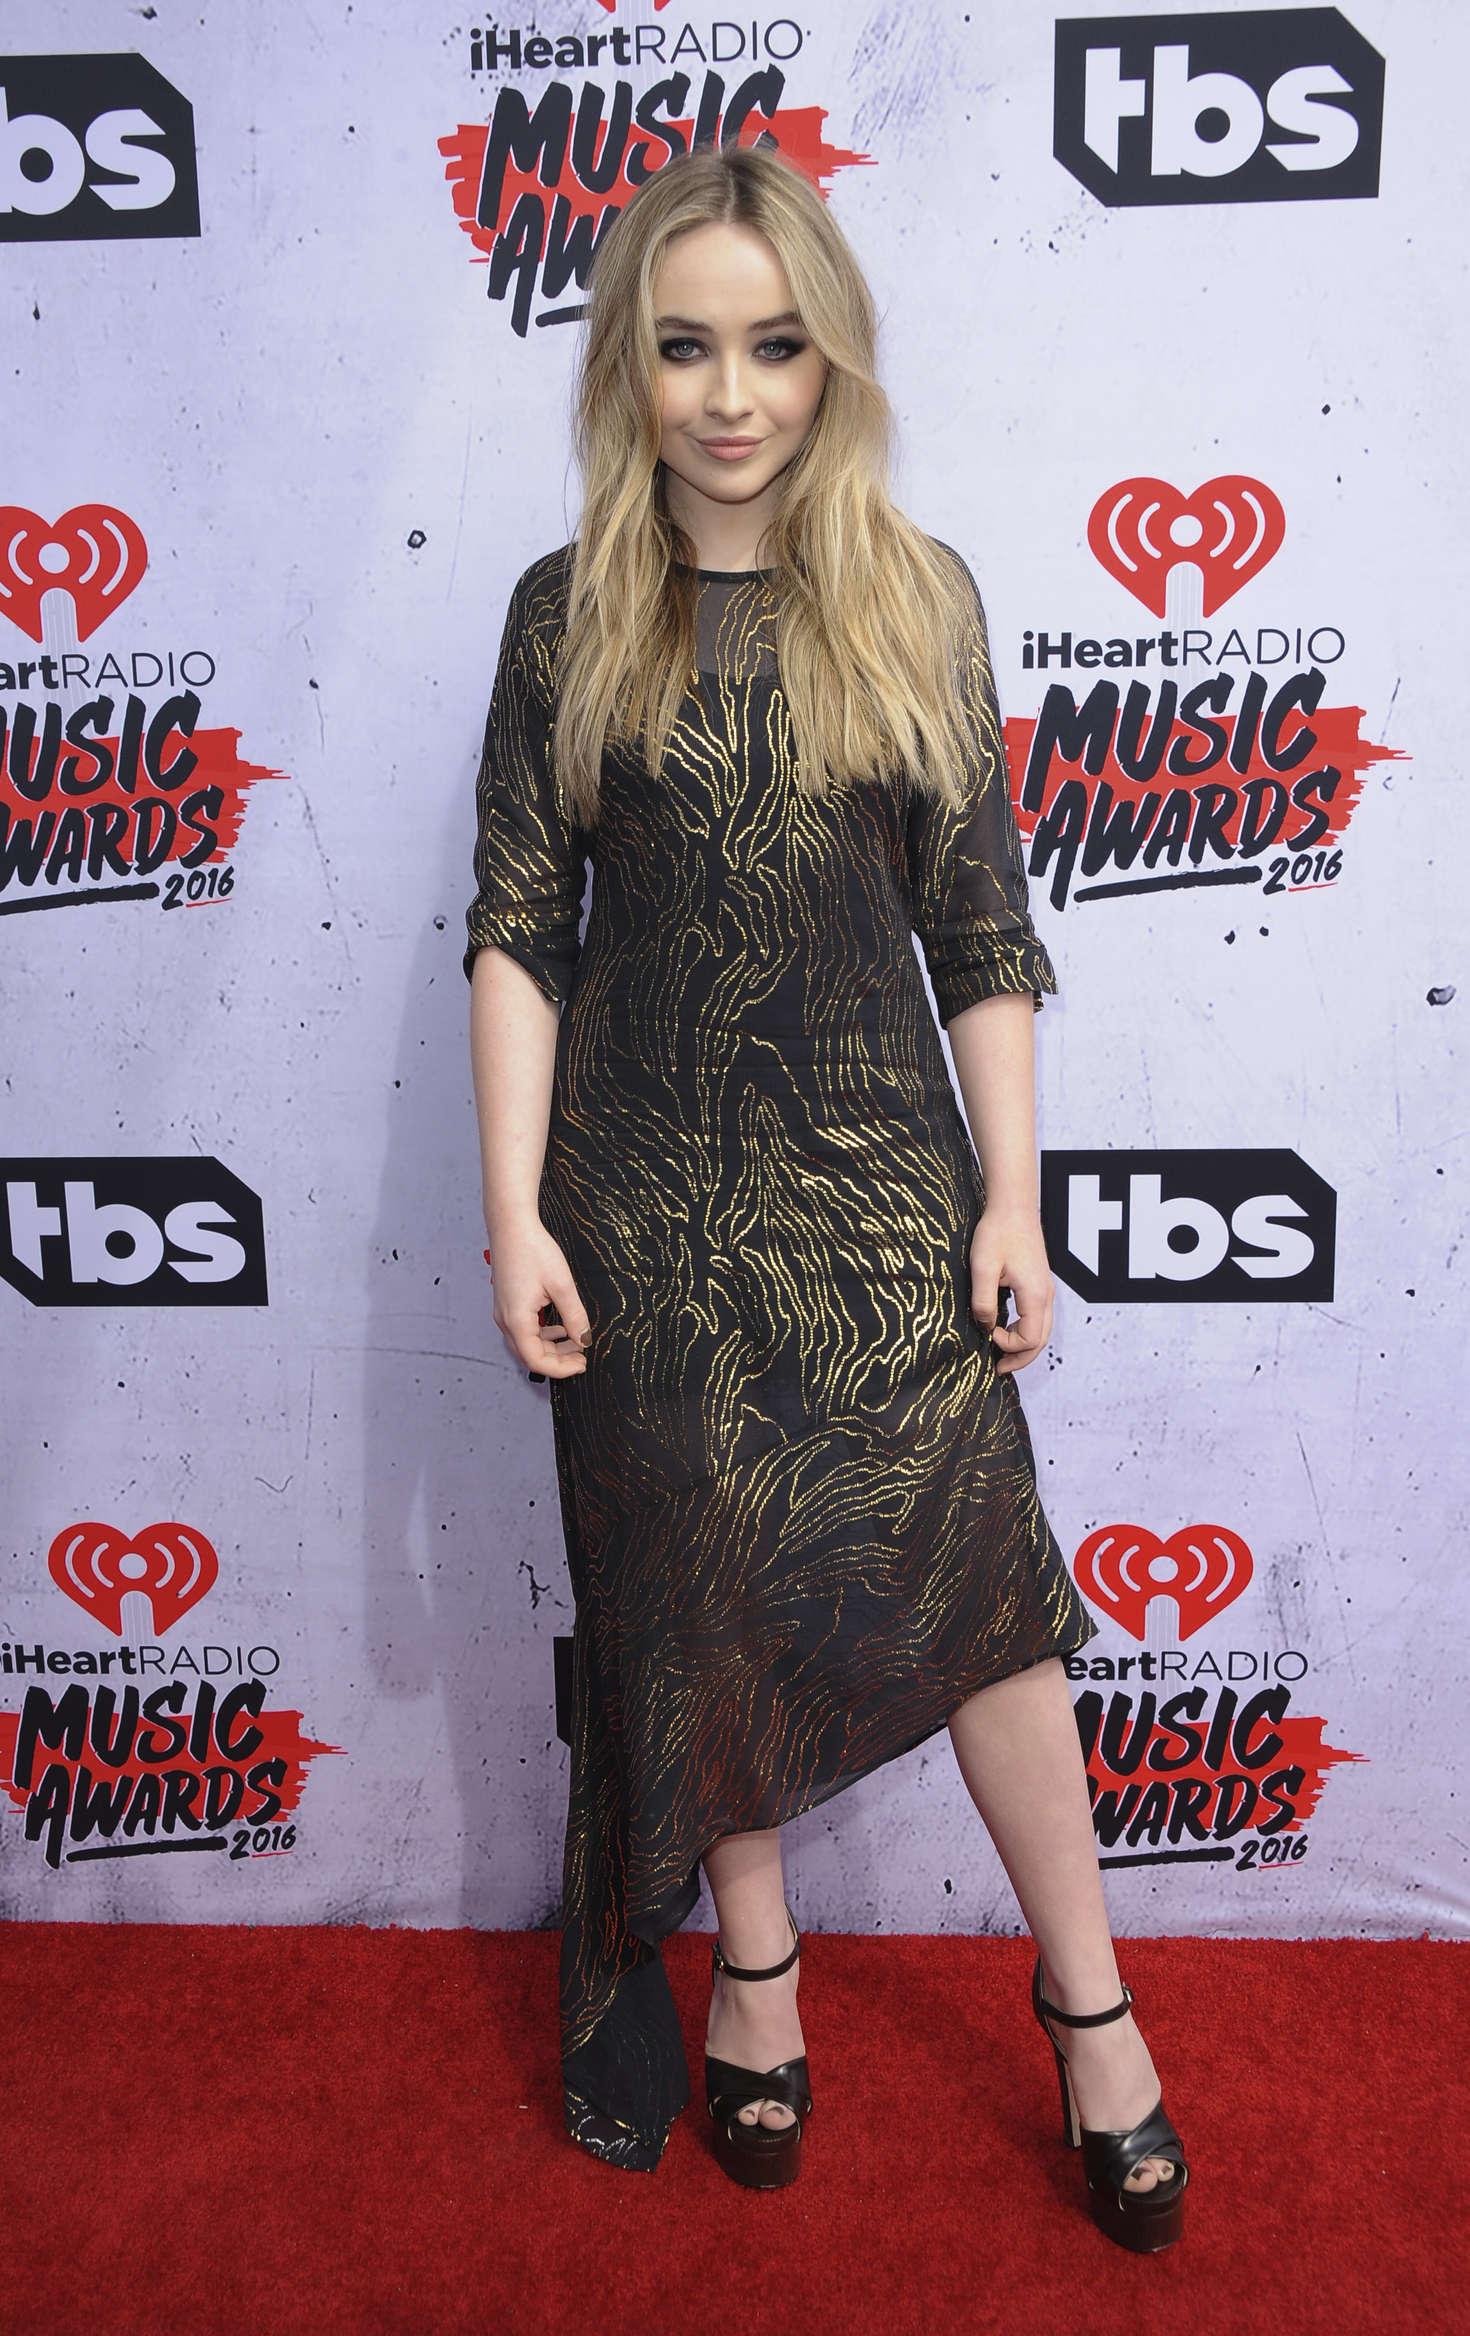 Sabrina Carpenter iHeartRadio Music Awards 2016  07 1470x2336